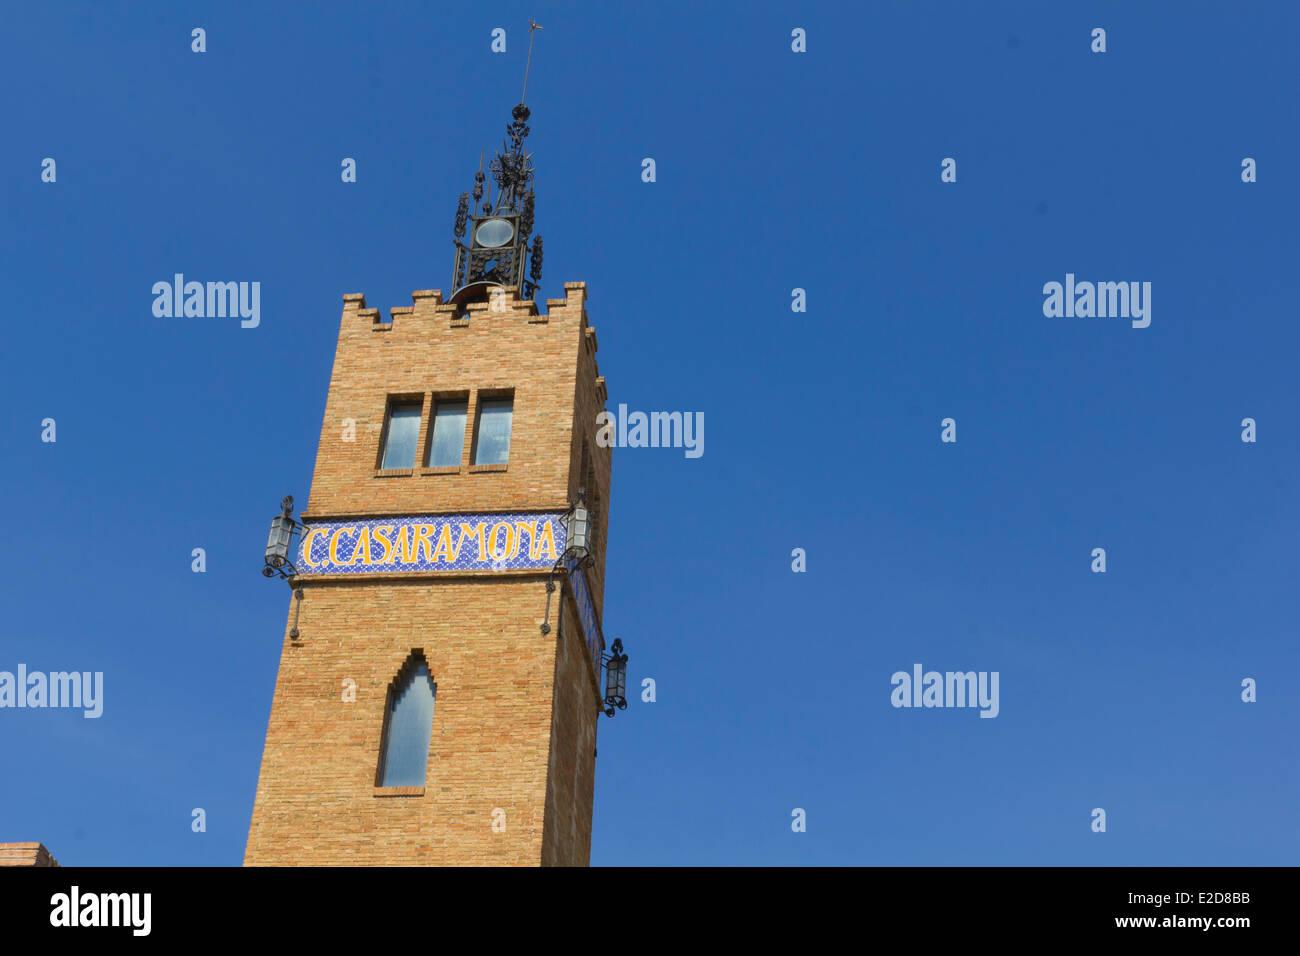 Casaramona Tower, former textile factory, Art Nouveau, 1911. Barcelona, Catalonia, Spain. - Stock Image